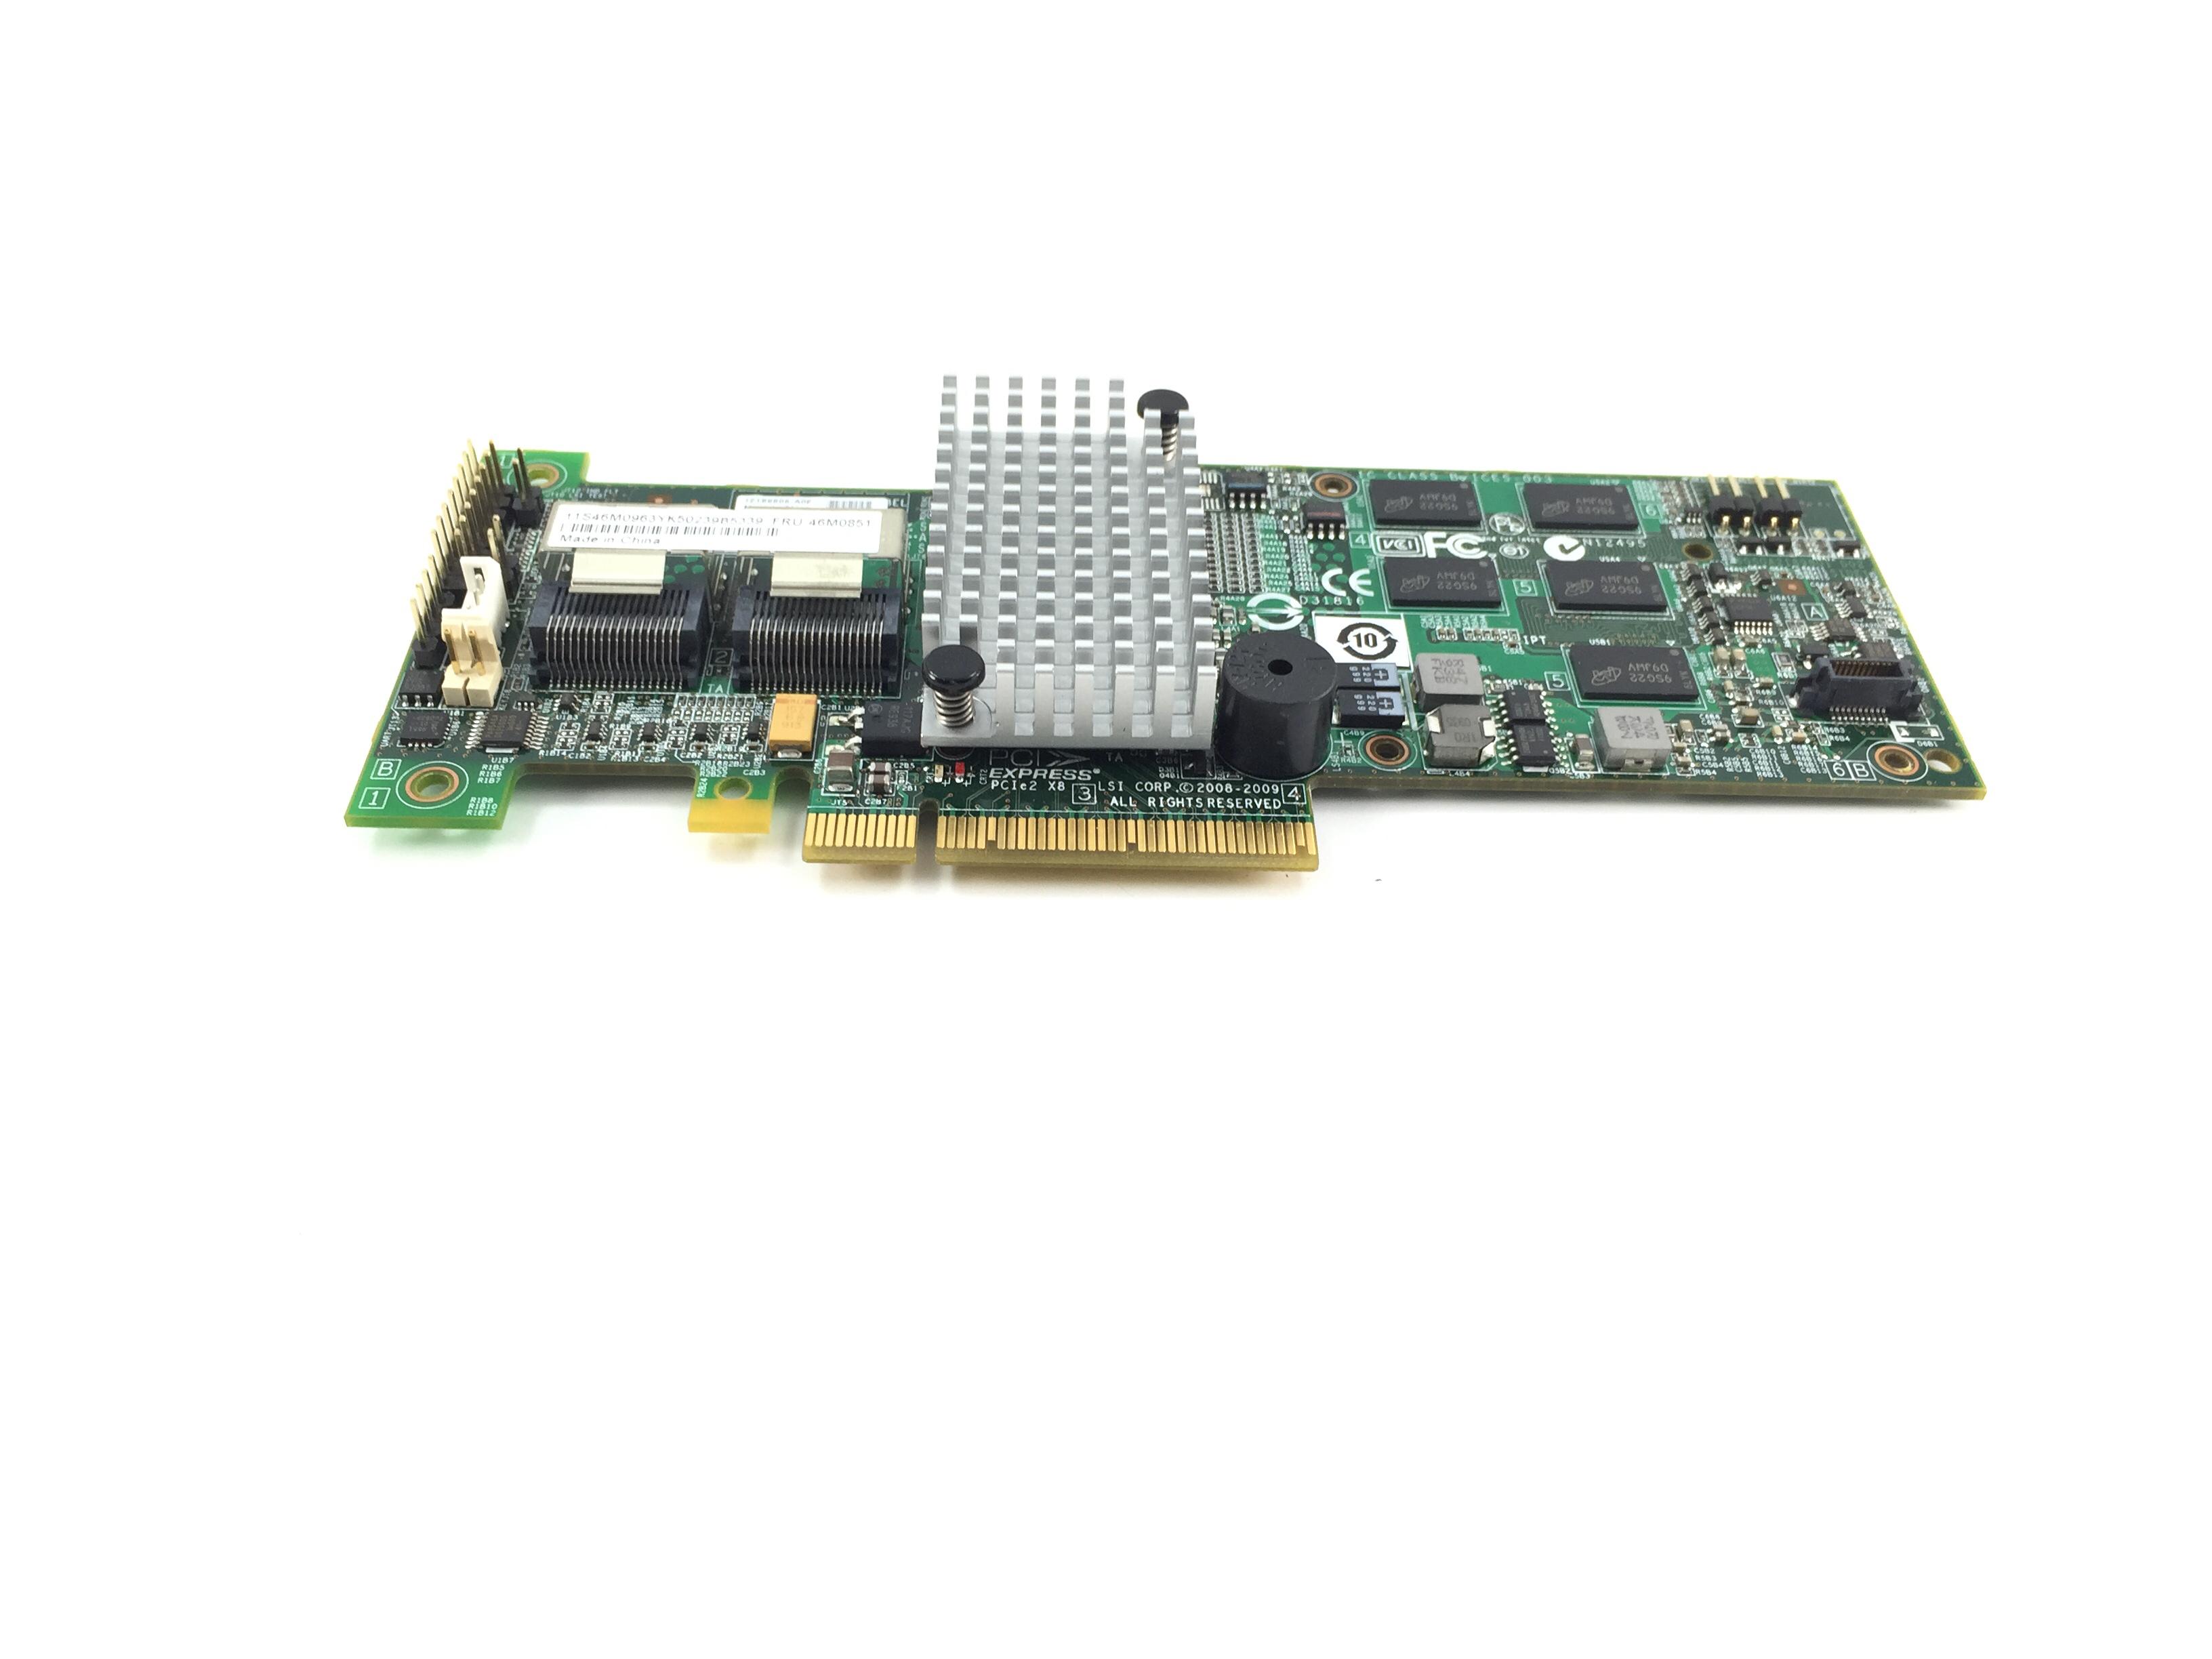 IBM SERVERAID M5015 6GBPS SAS/SATA RAID CONTROLLER (46M0851)